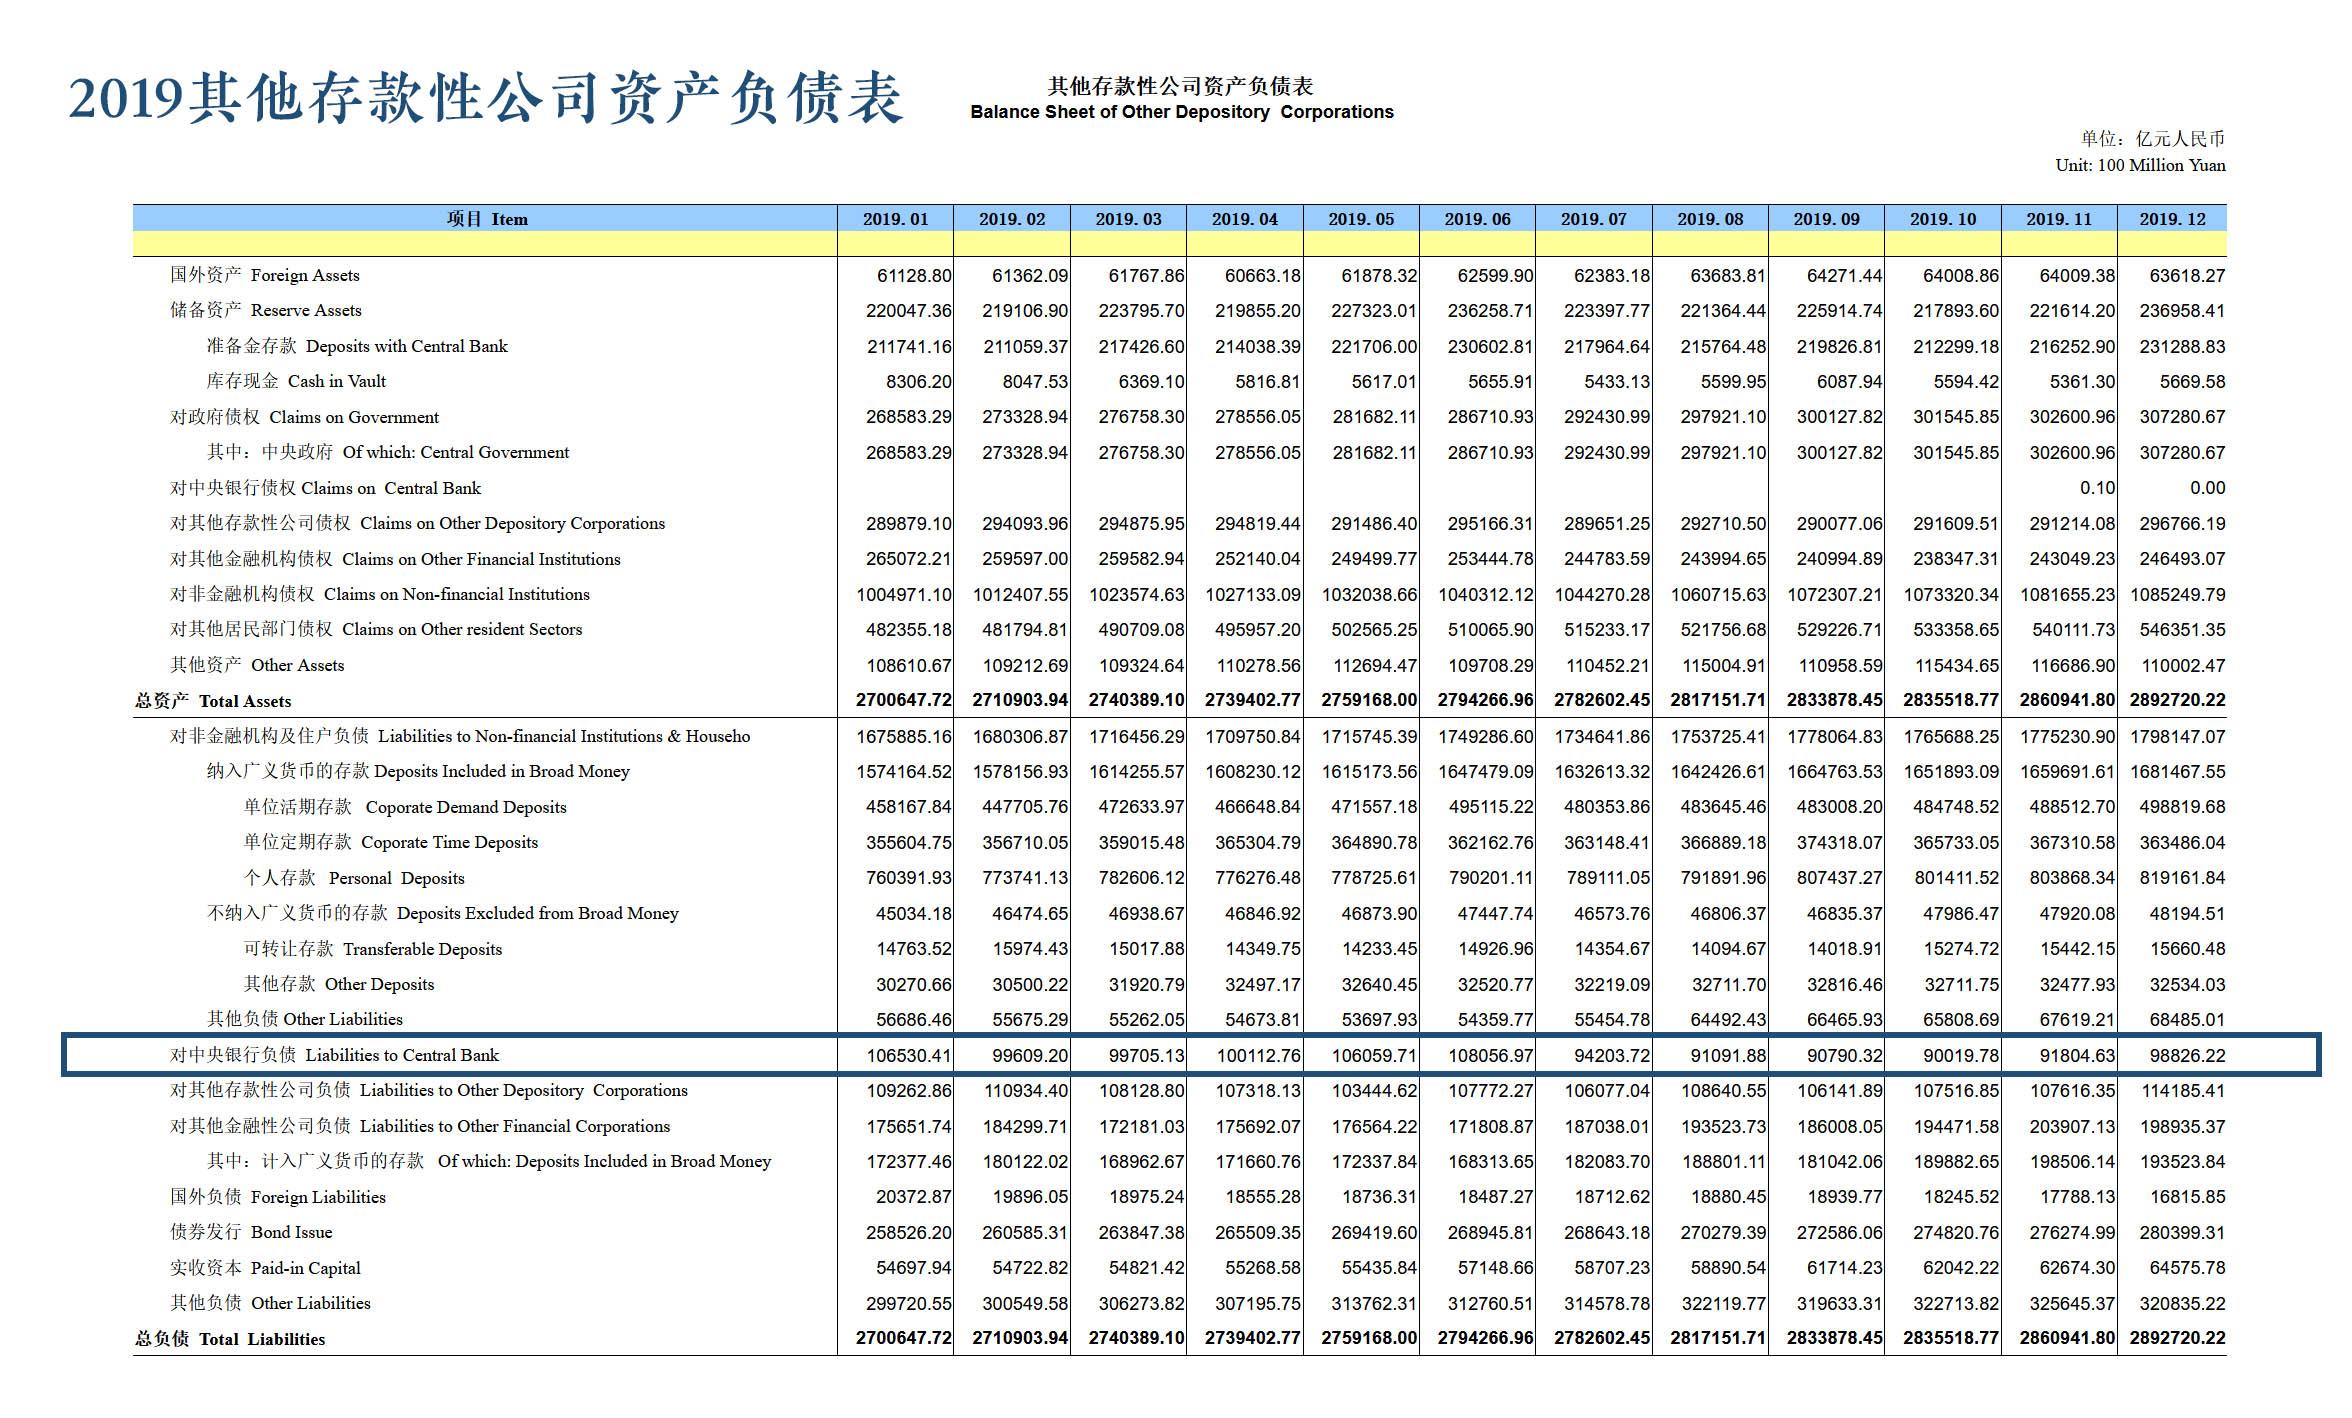 2019 ODC Balance Sheet